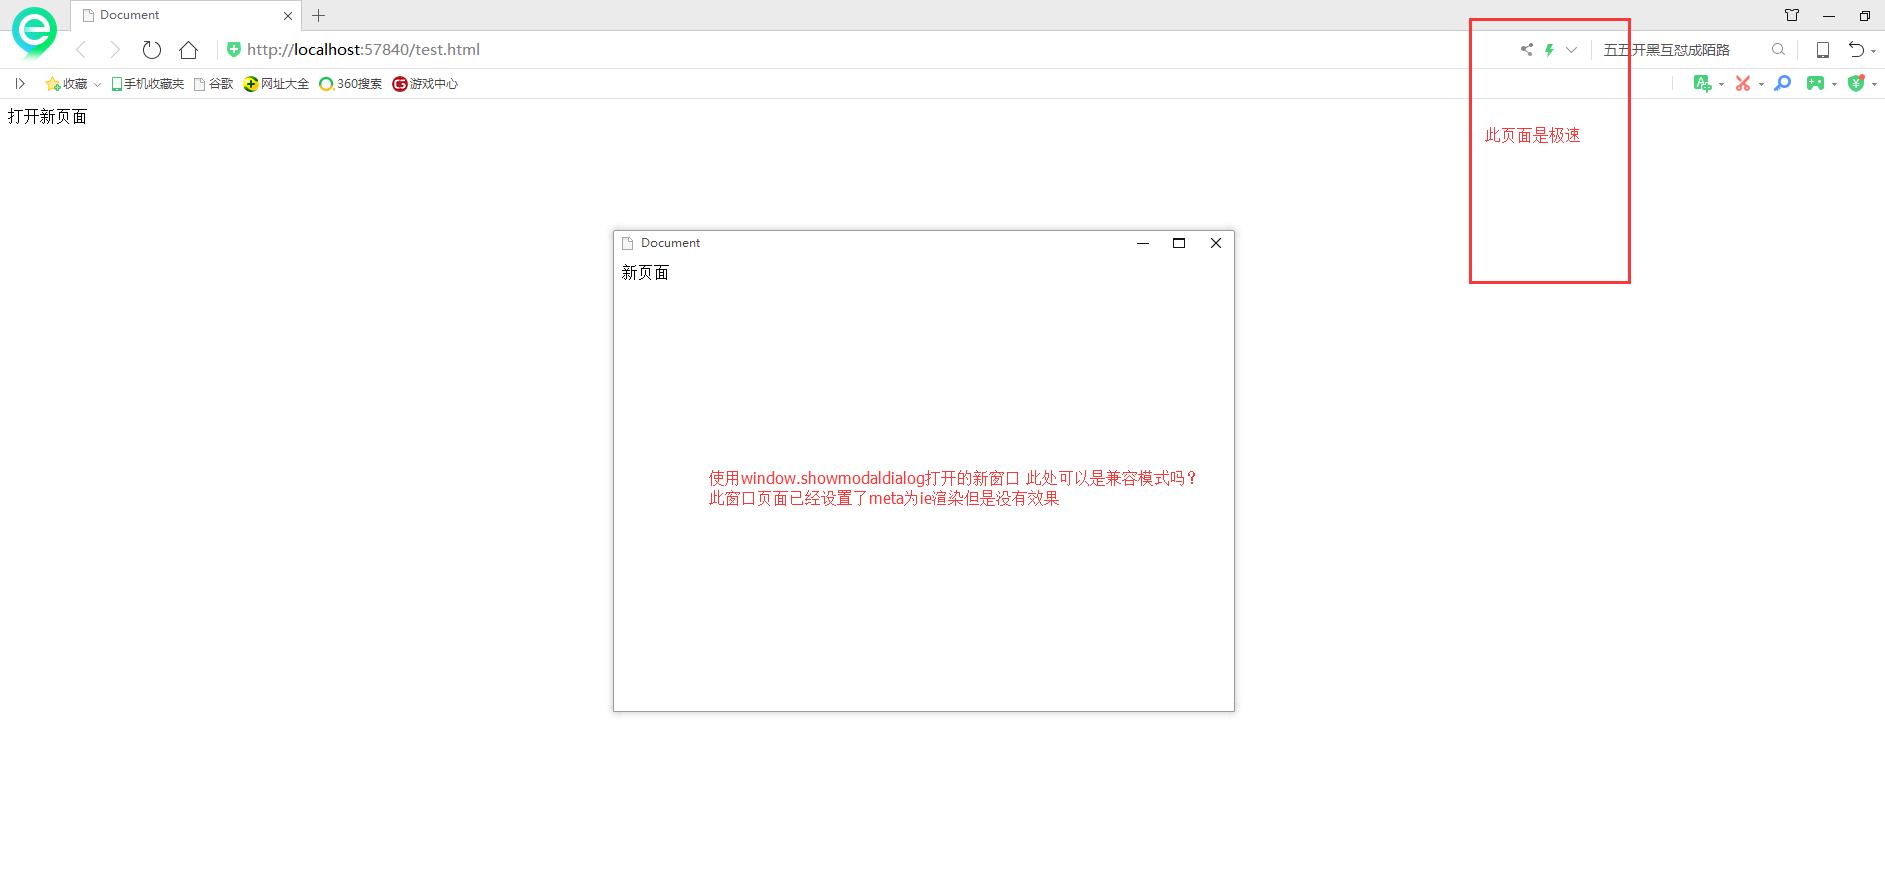 js window.showModalDialog打开新窗口问题